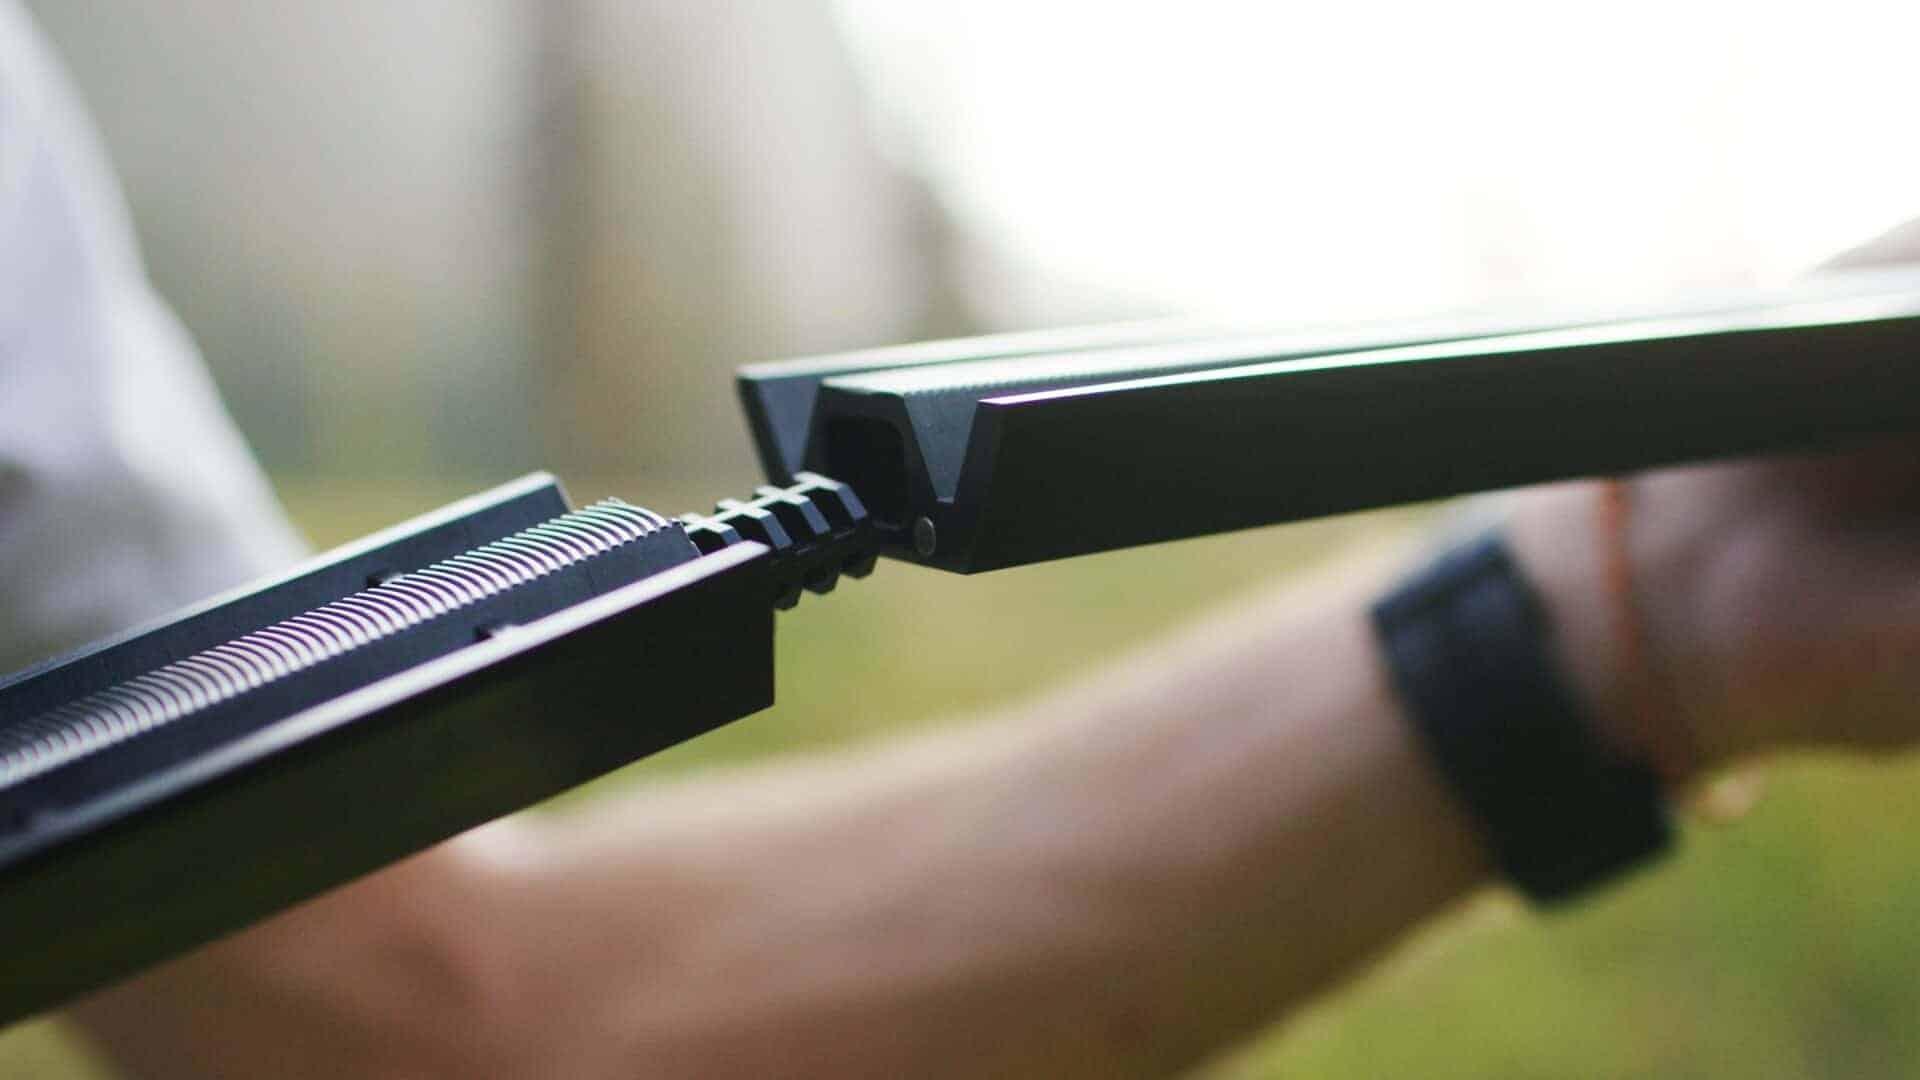 Trek Modular Camera Slider System From Dyno Electronics Press Material 09